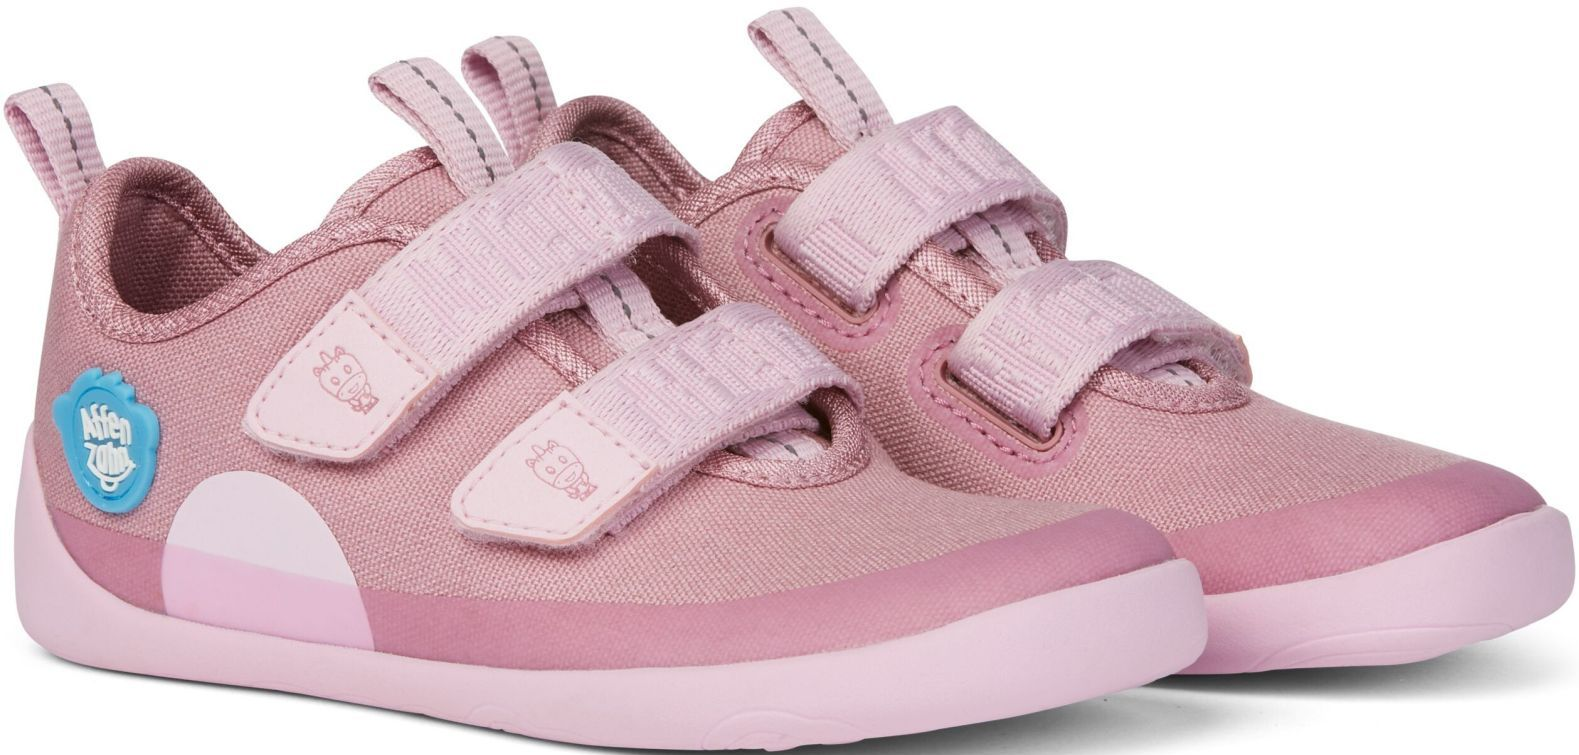 Levně Affenzahn Lowcut Cottoncorn-Pink 26